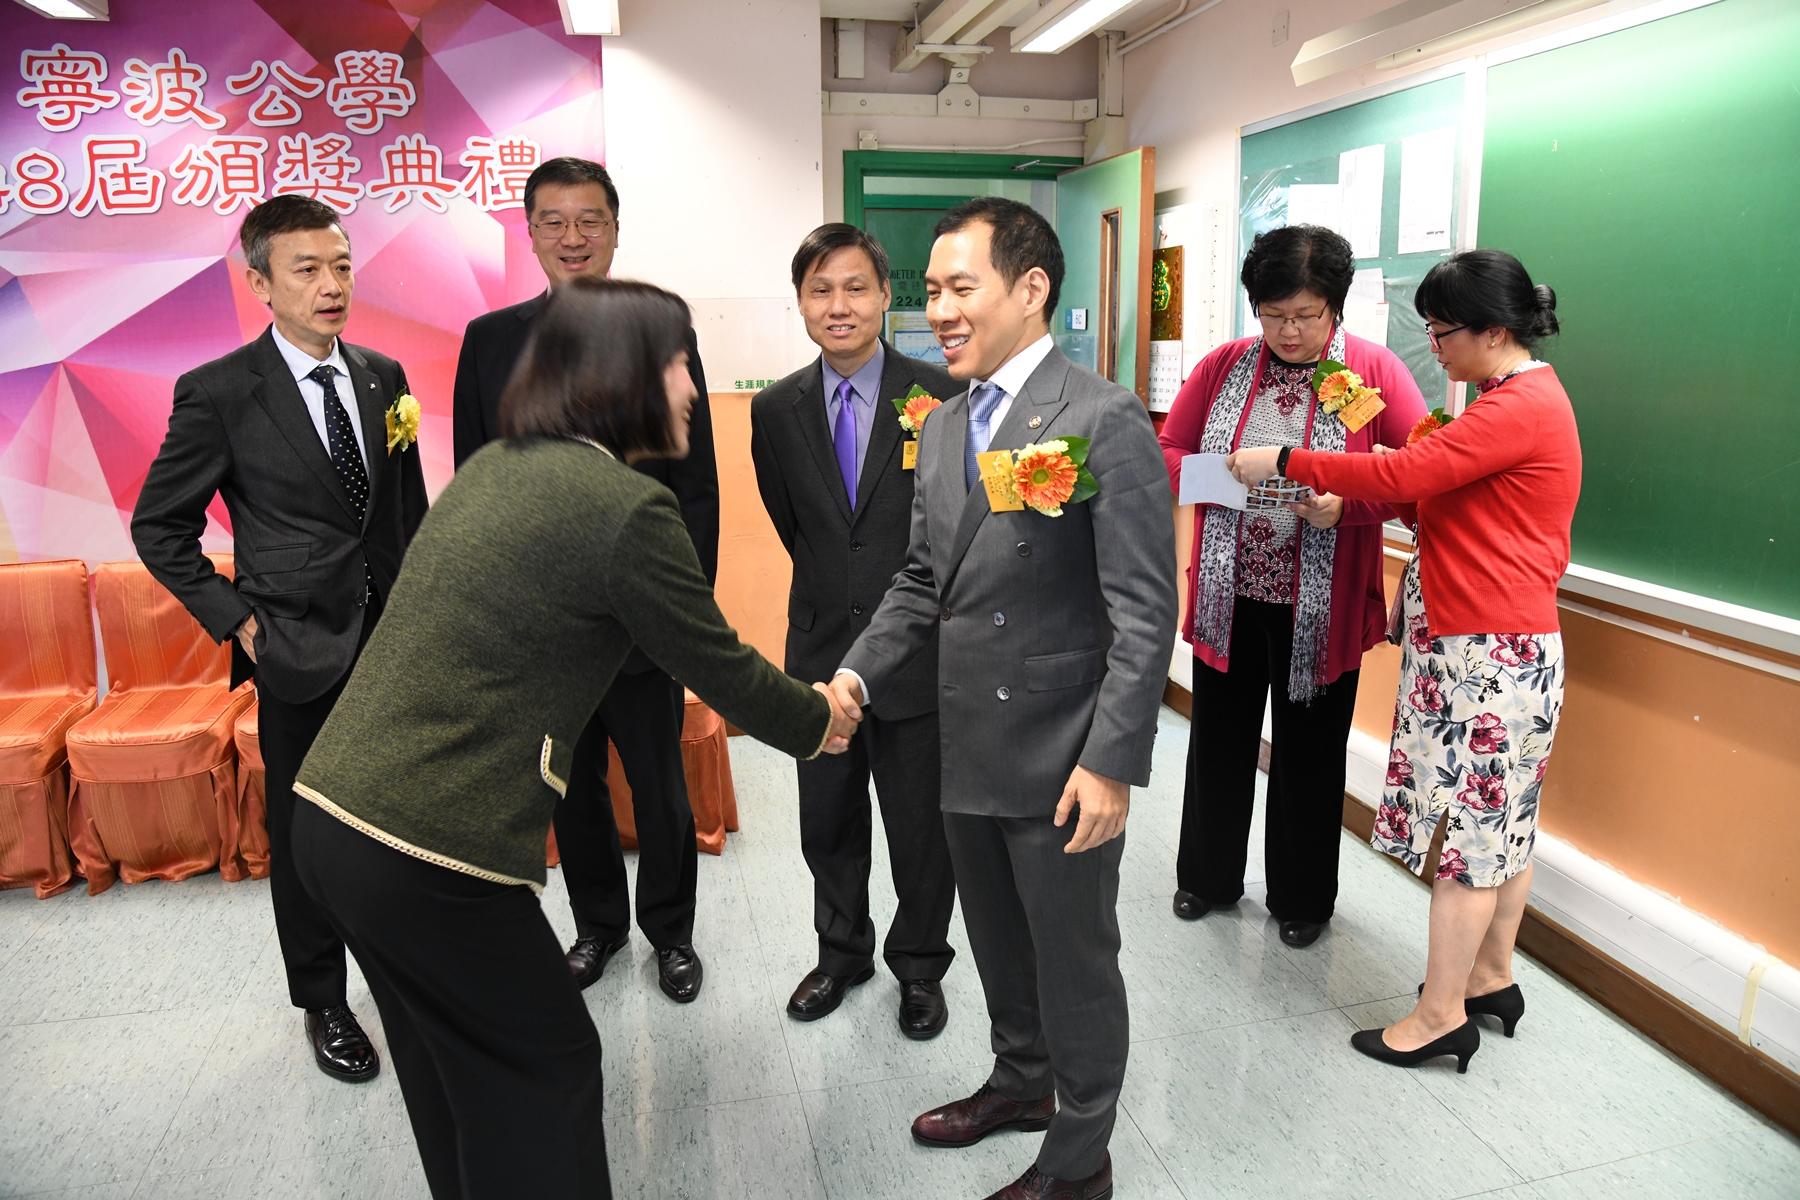 https://npc.edu.hk/sites/default/files/dsc_0313.jpg